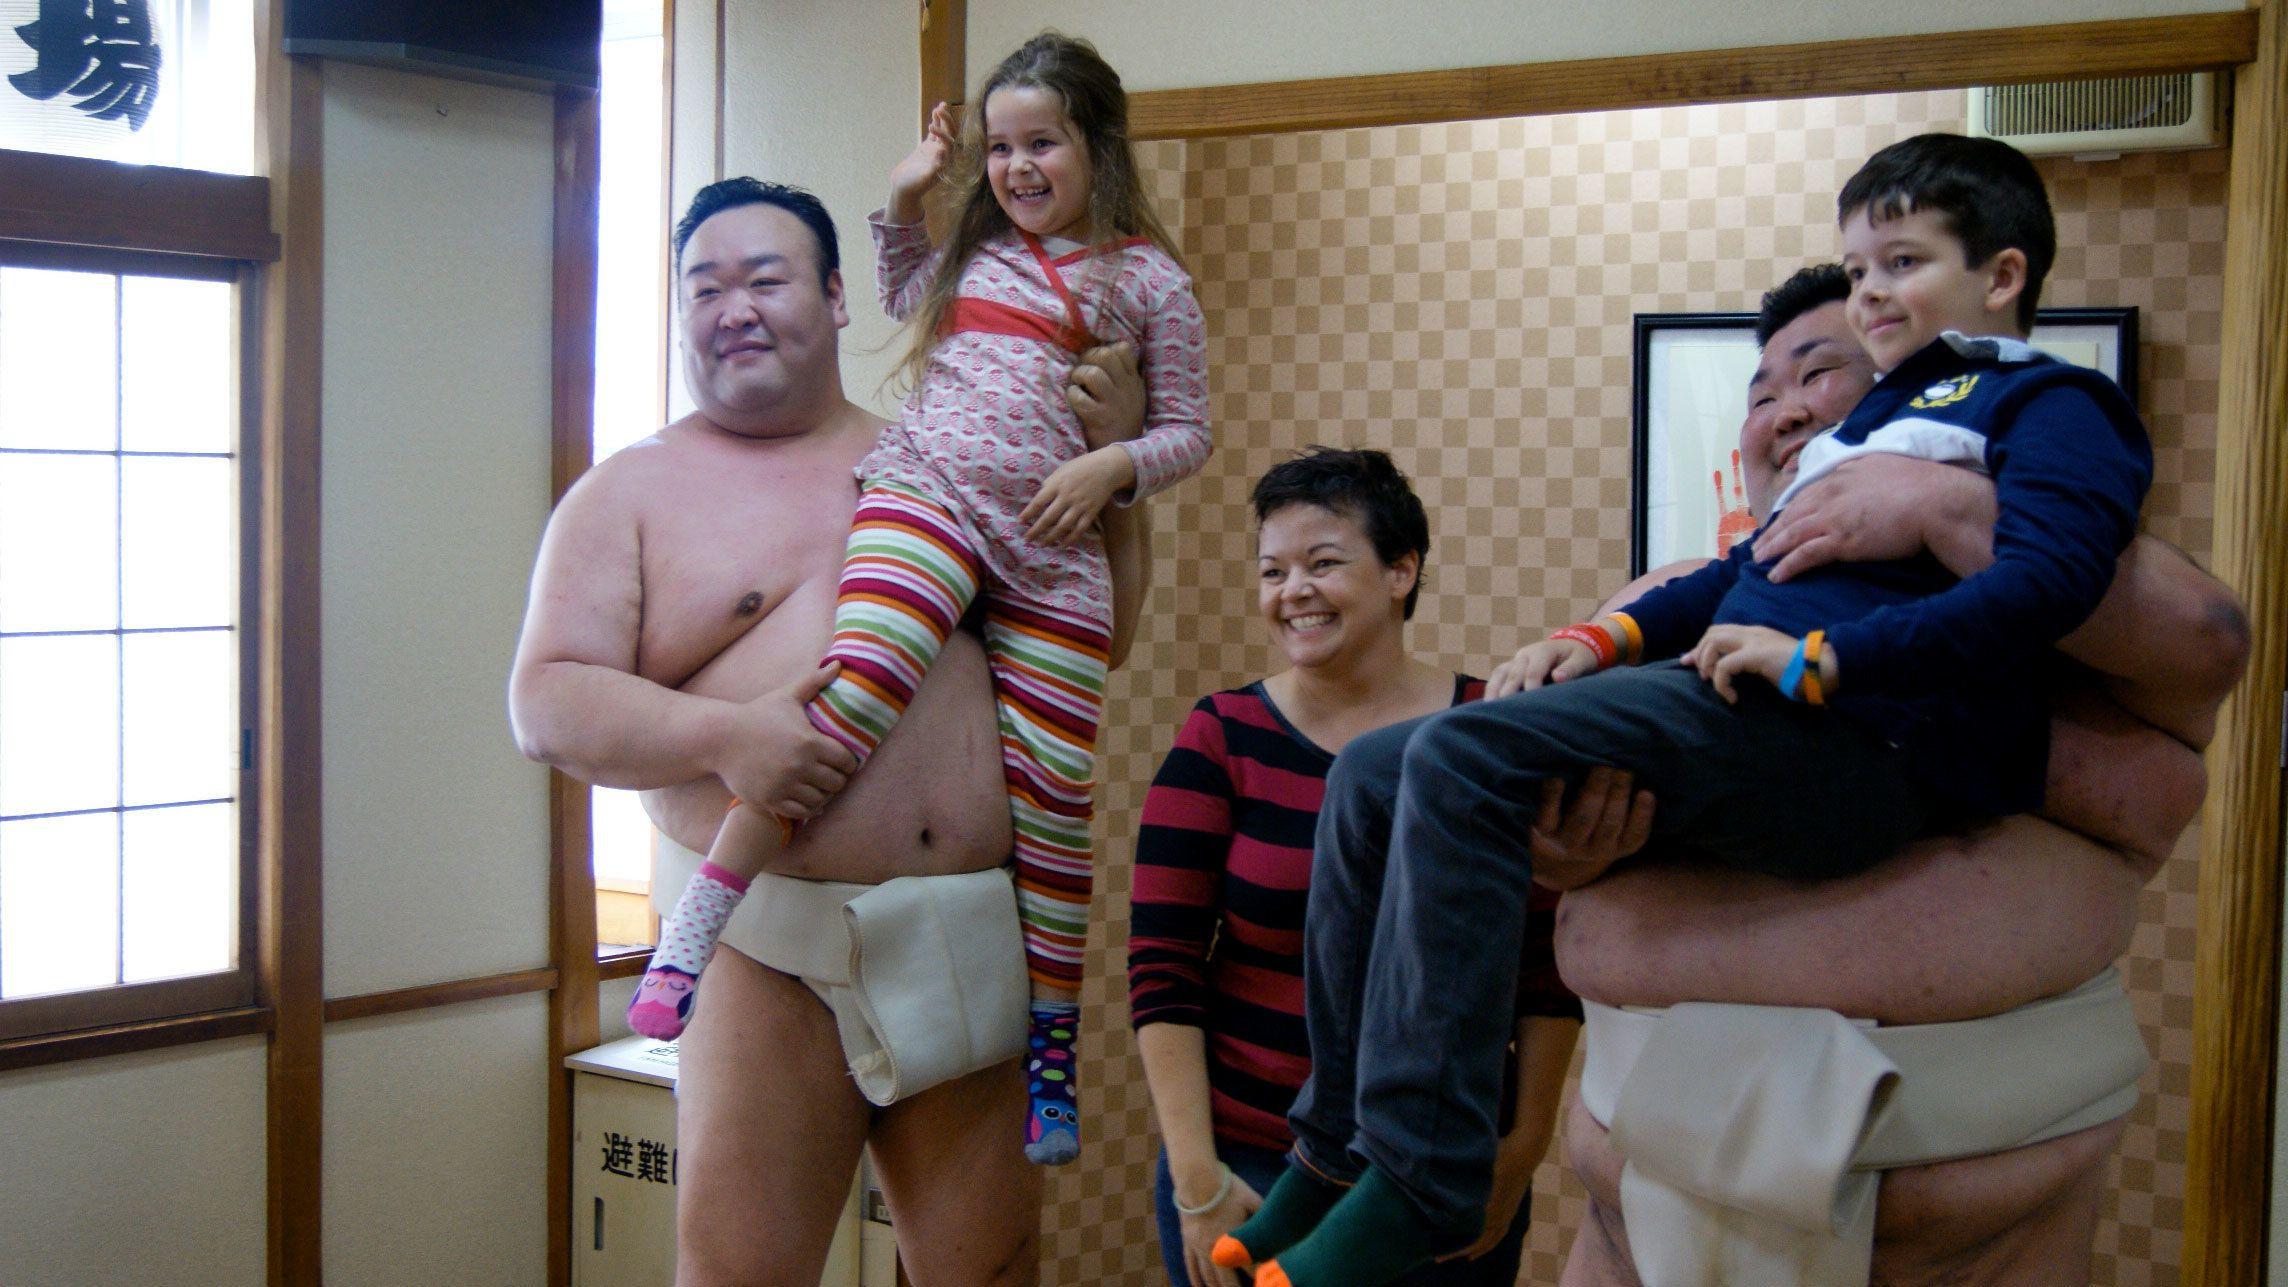 Sumo wrestlers holding children in Tokyo